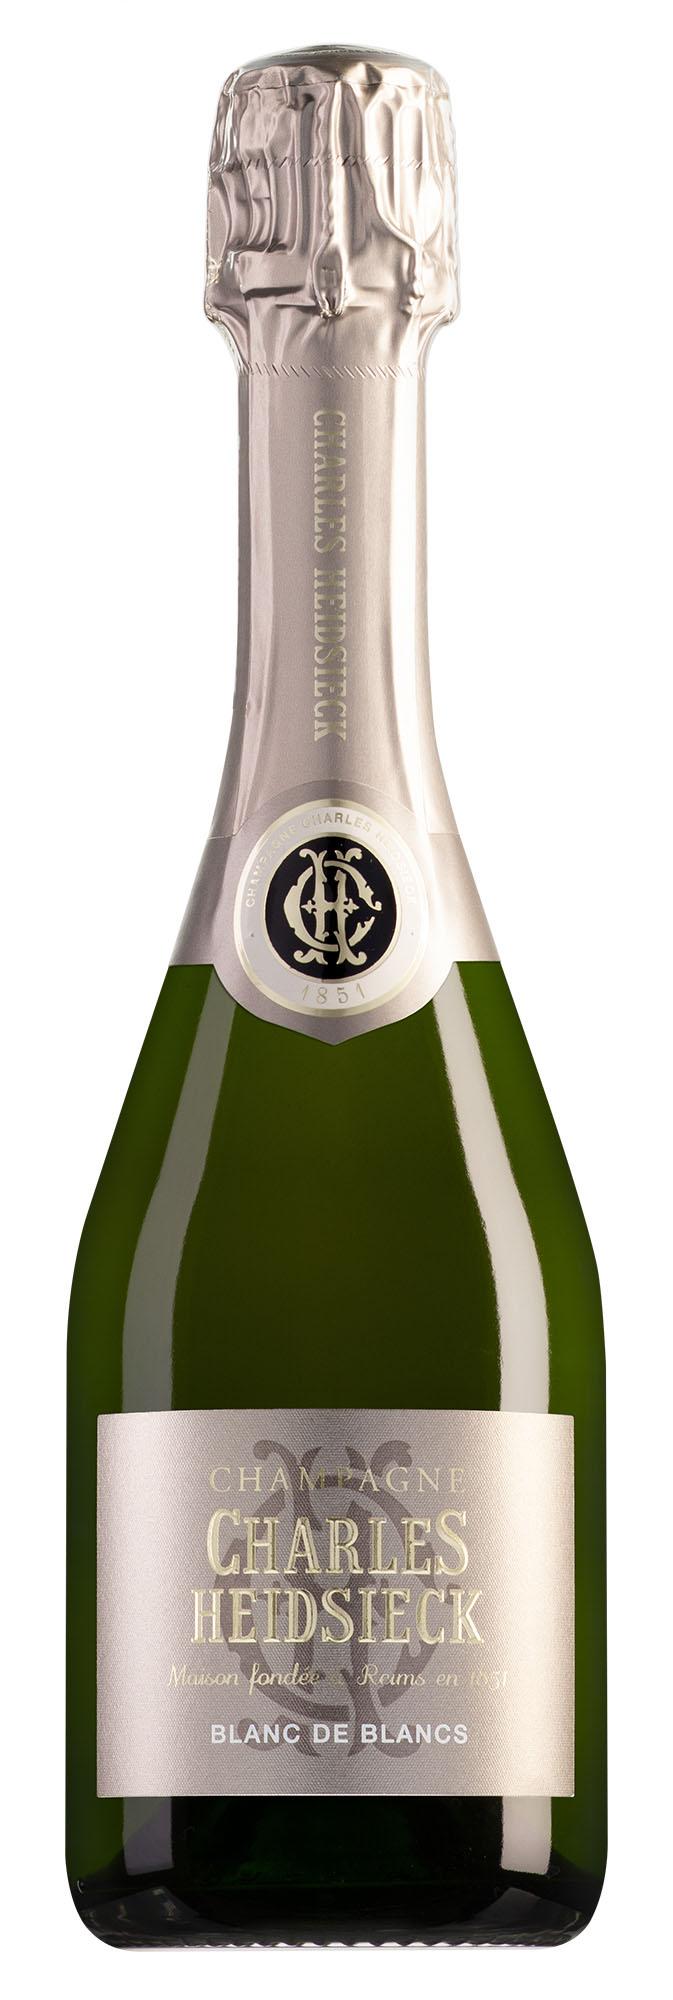 Charles Heidsieck Champagne Blanc de Blancs halve fles